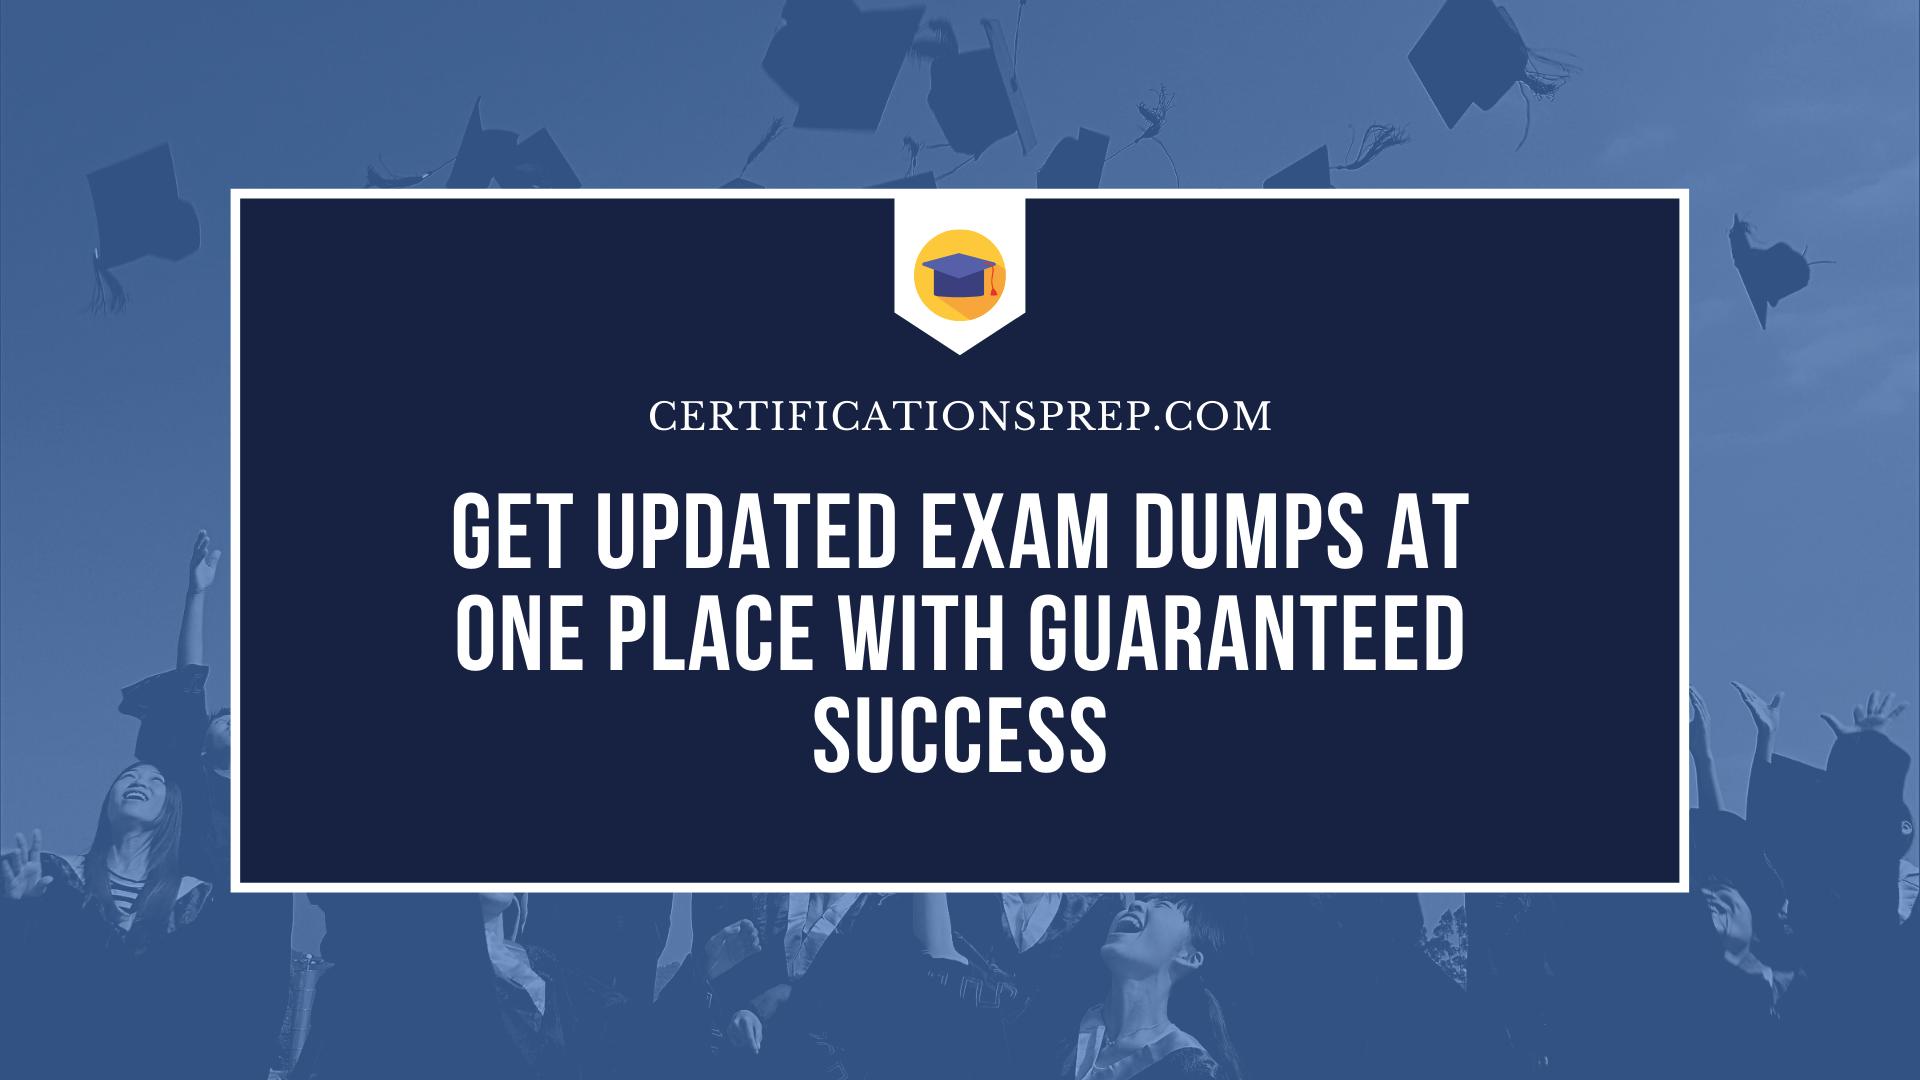 200-301 exam dumps